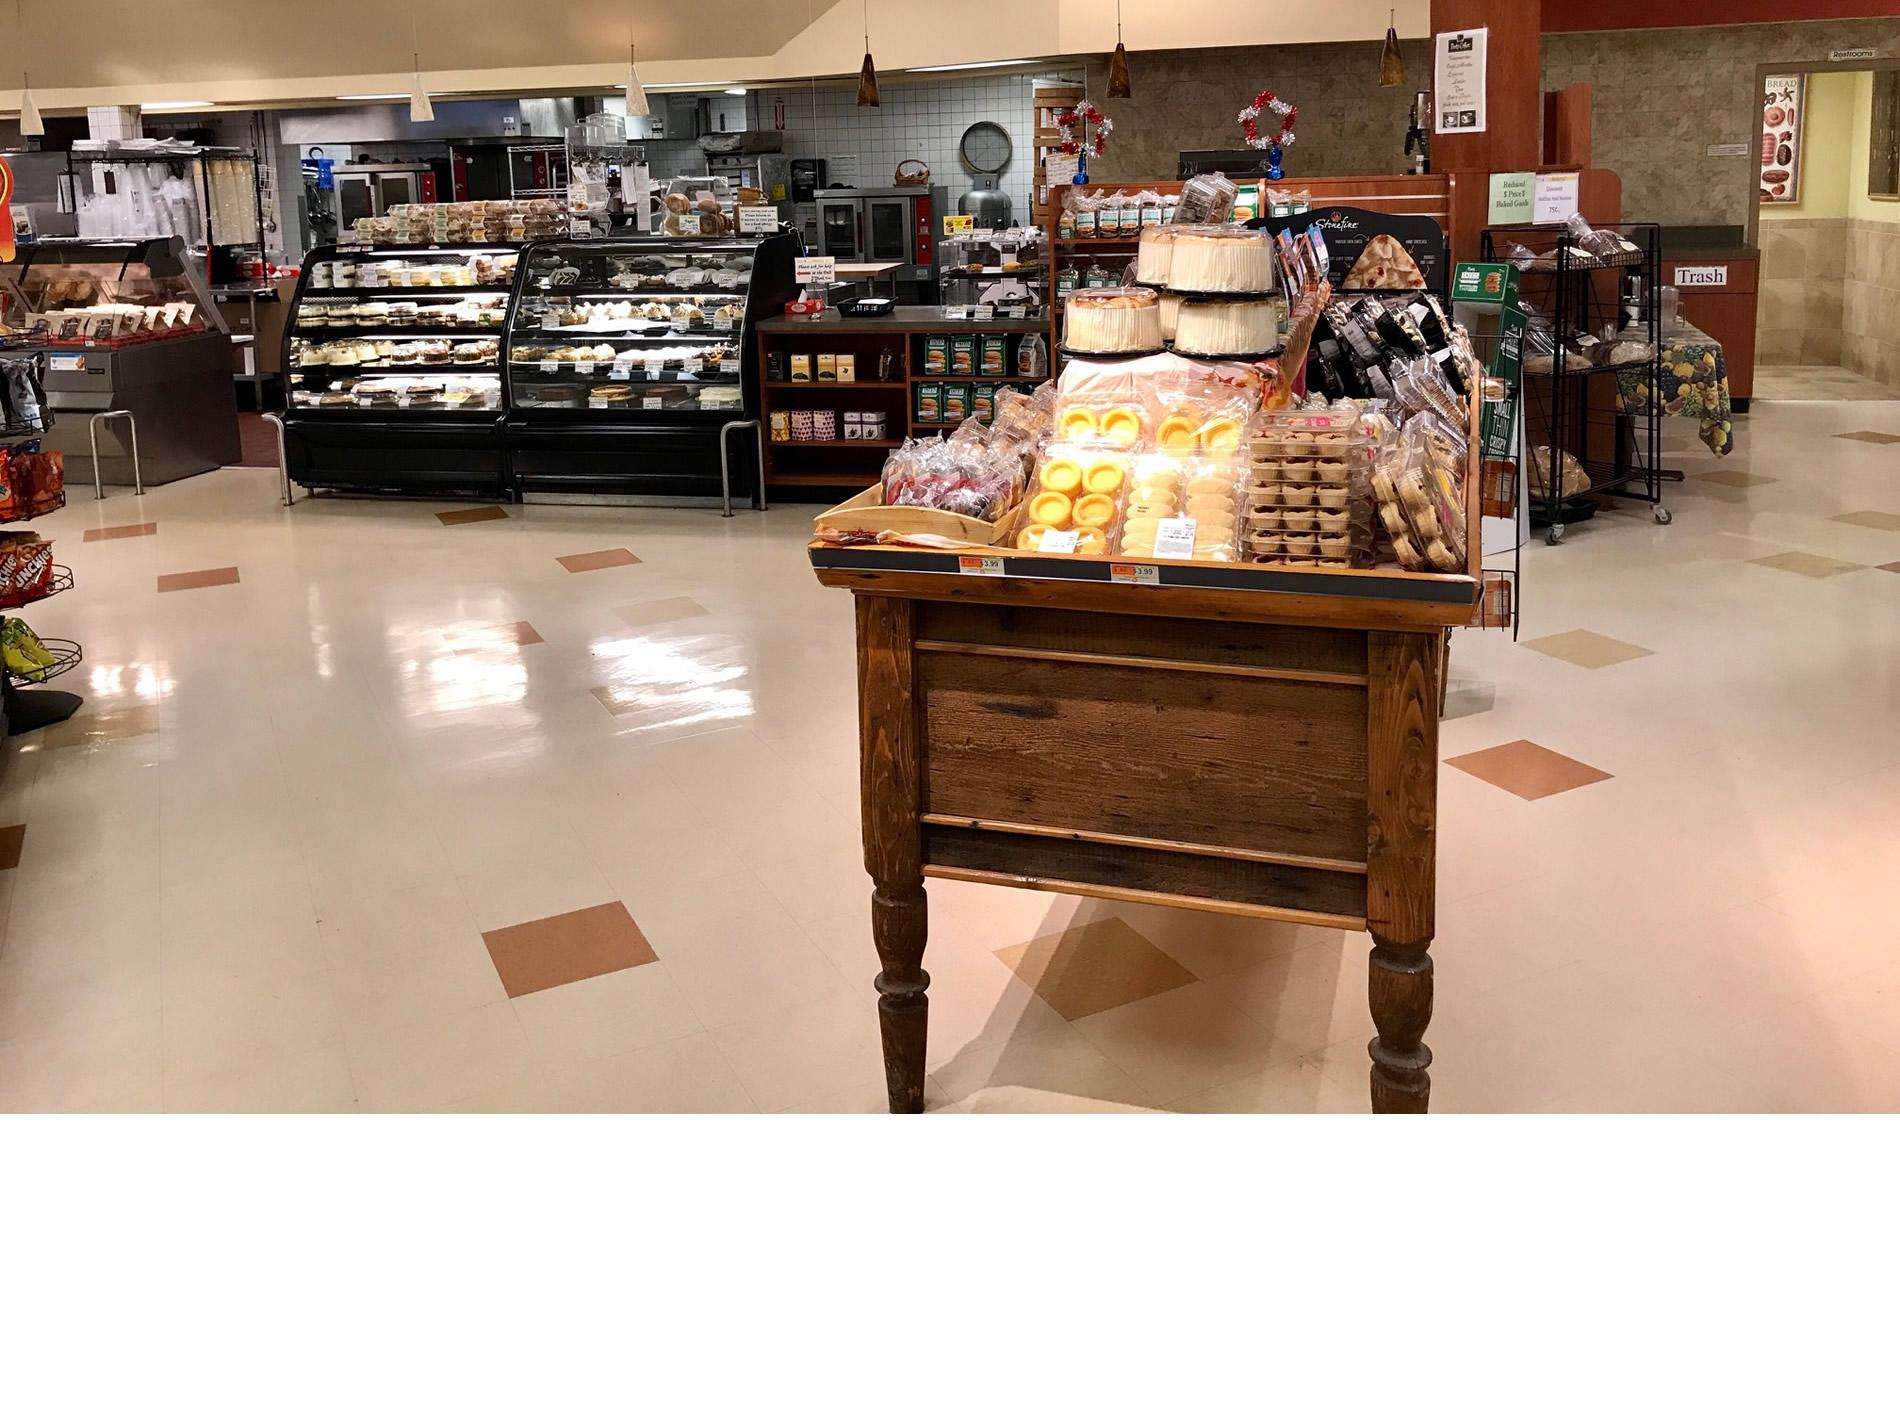 Foodies_Markets_Duxbury_15